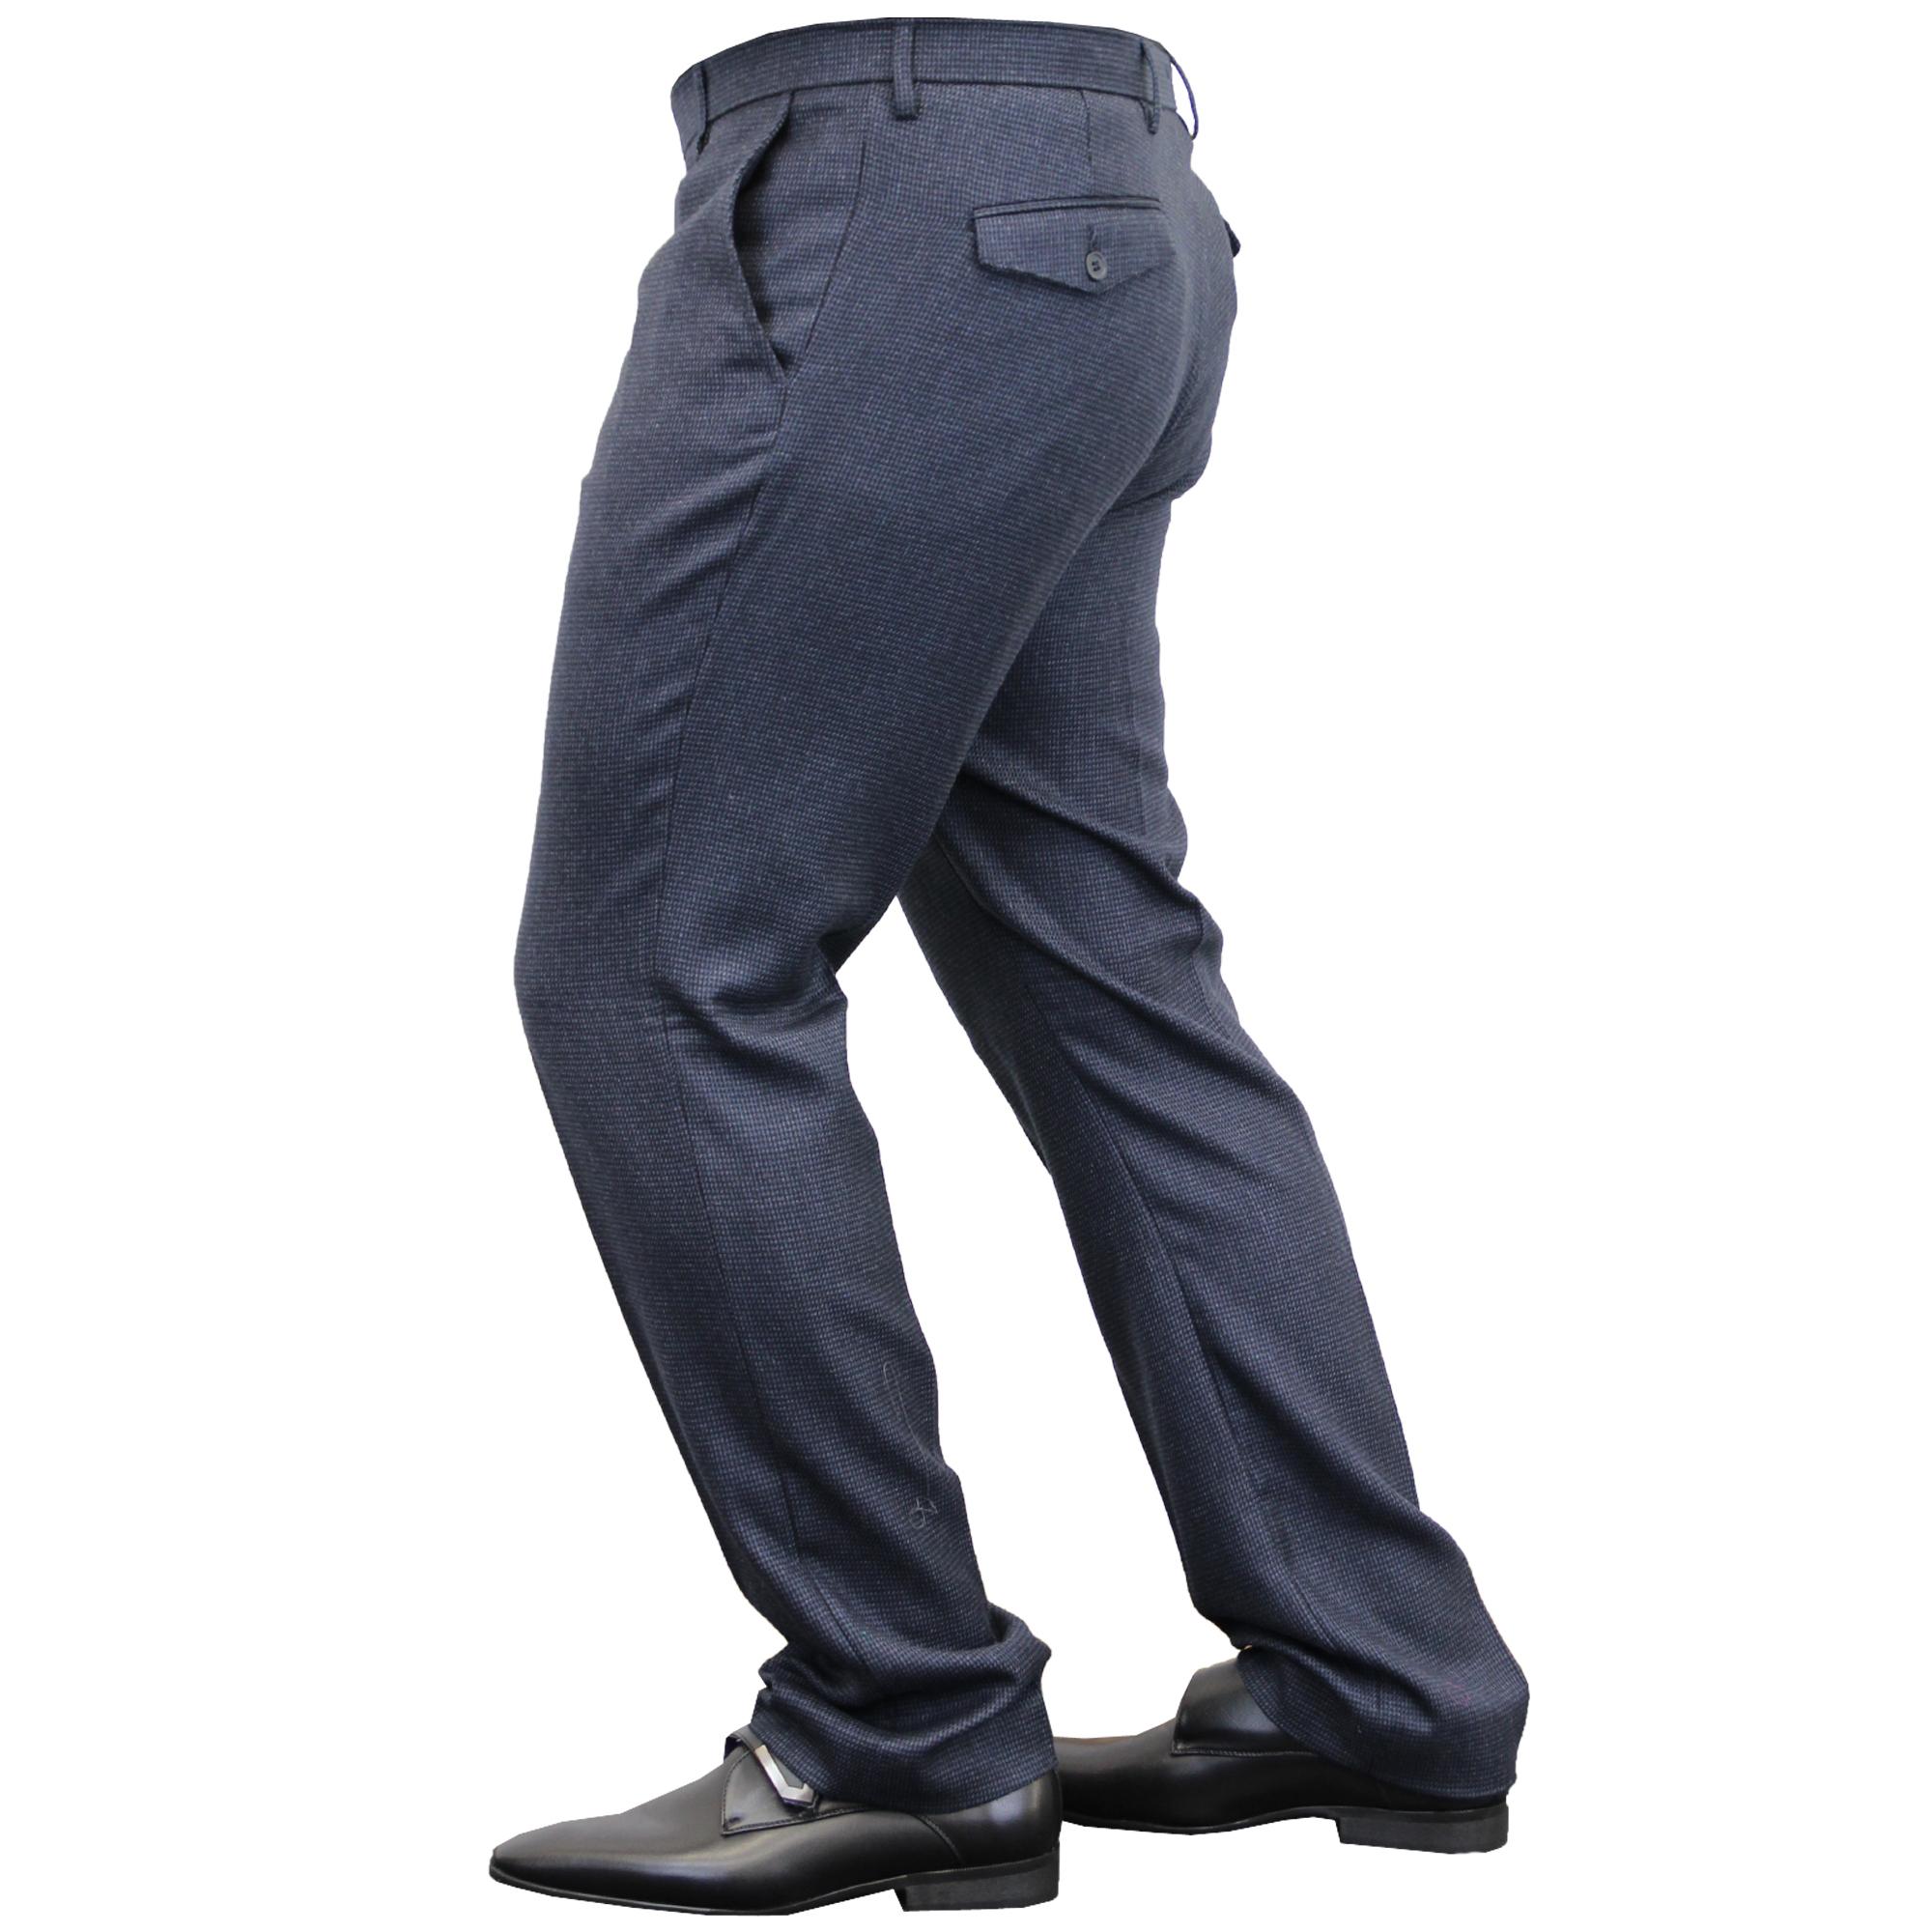 Mens-Trouser-Cavani-Pants-Formal-Wedding-Office-Work-Smart-Fashion-Casual-New thumbnail 4